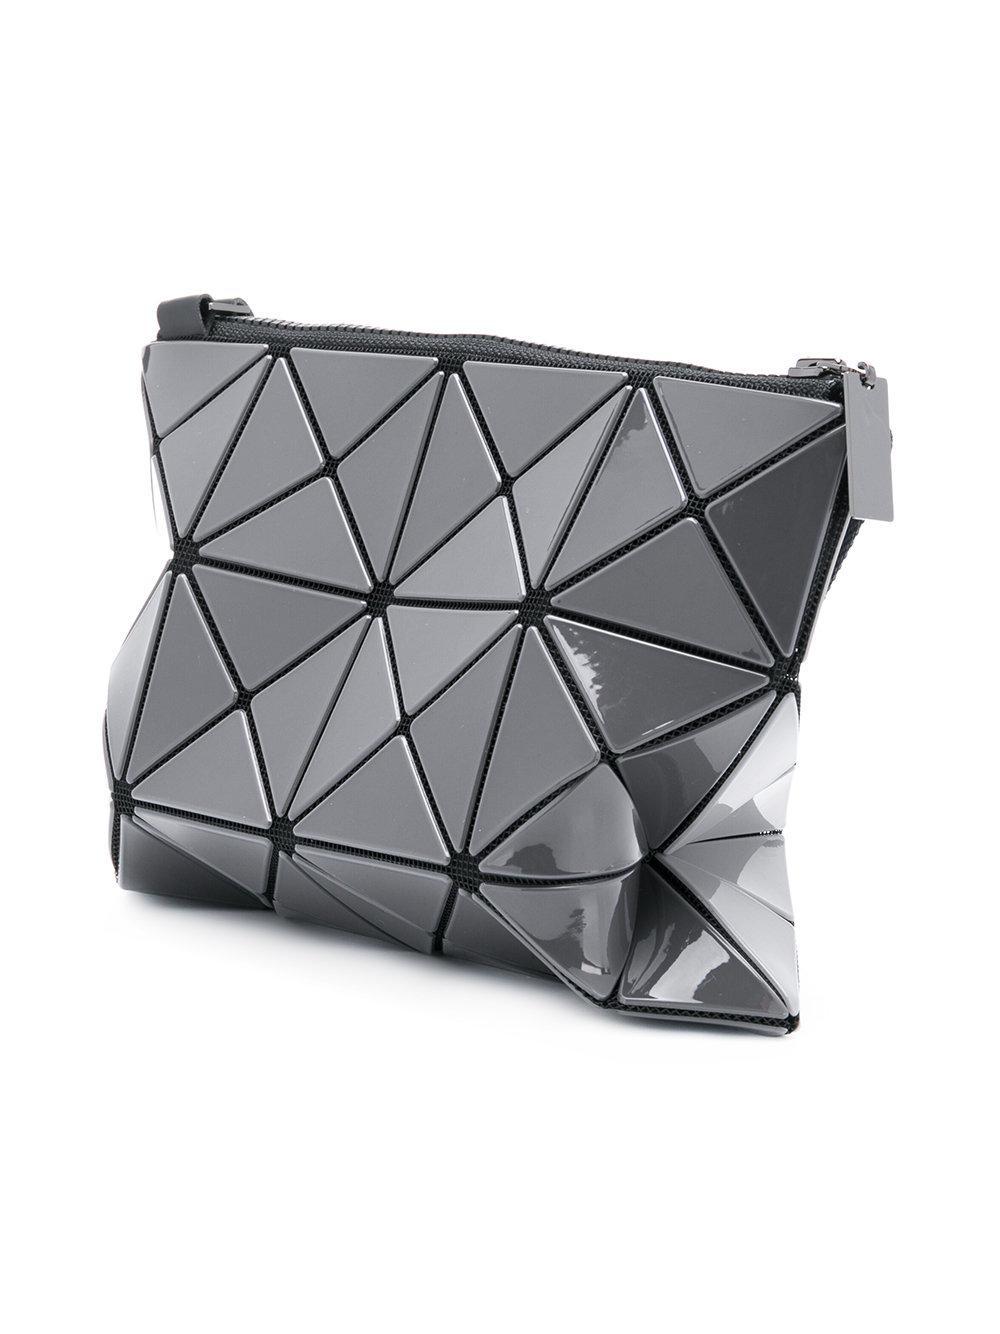 Bao Bao Issey Miyake Geometric Cross-body Bag in Grey (Grey)